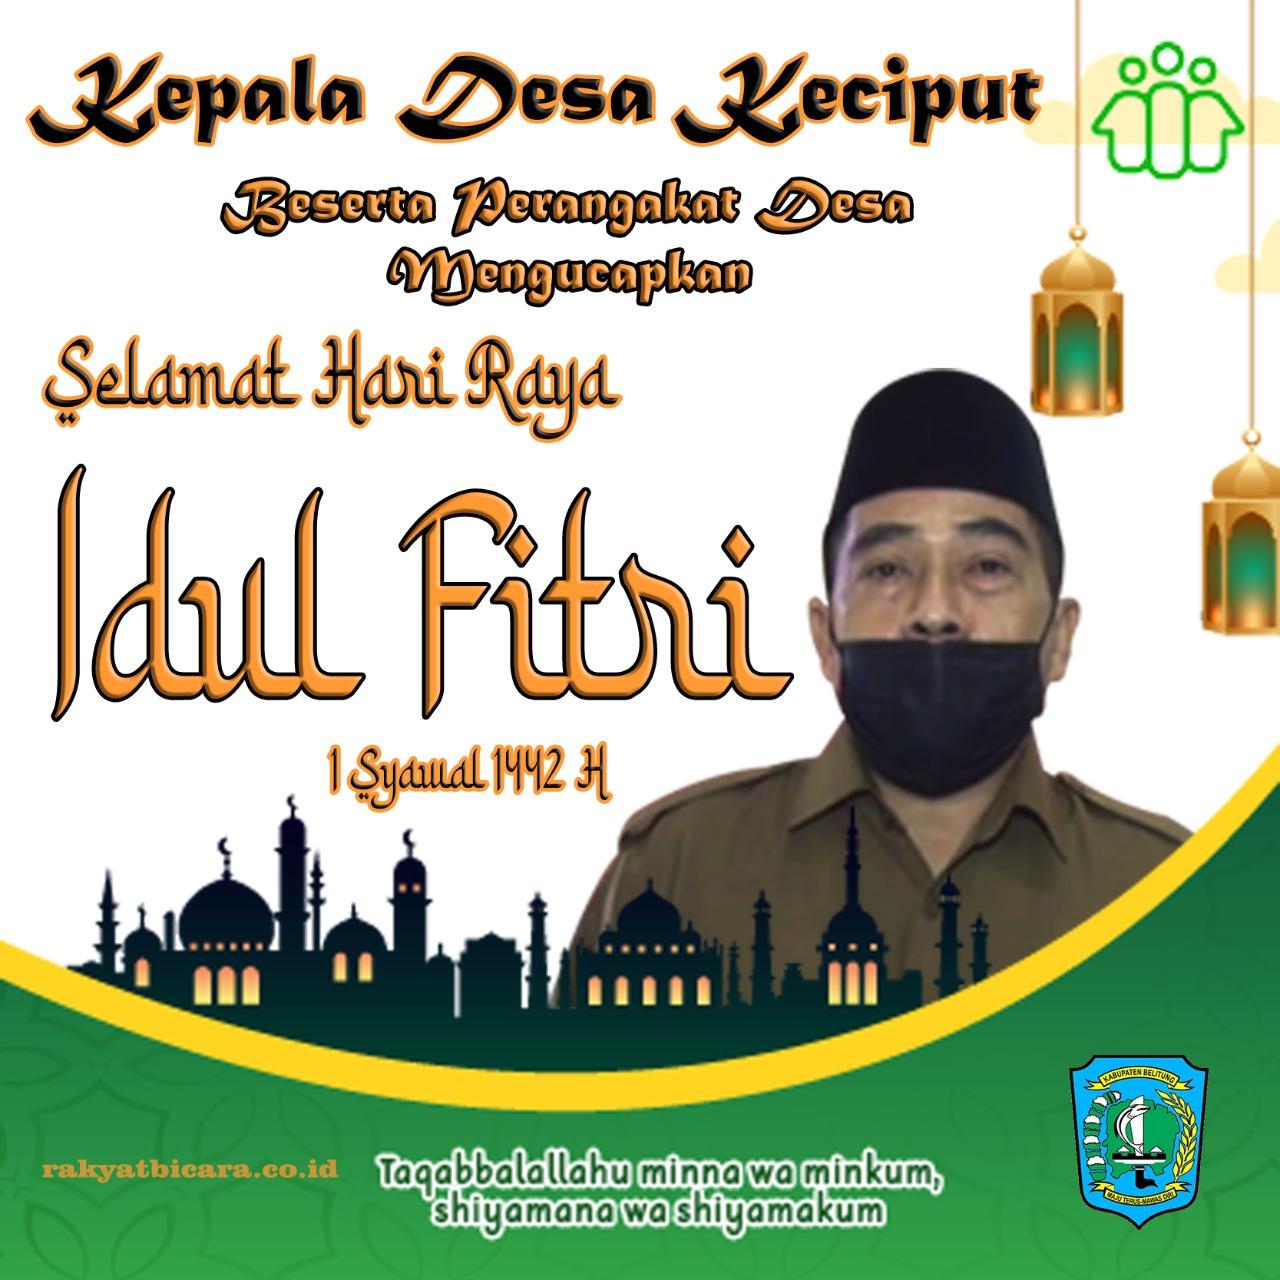 Kepala Desa Keciput Beserta Perangkat Desa Mengucapkan, Selamat Idul Fitri 1 Syawal 1442 H